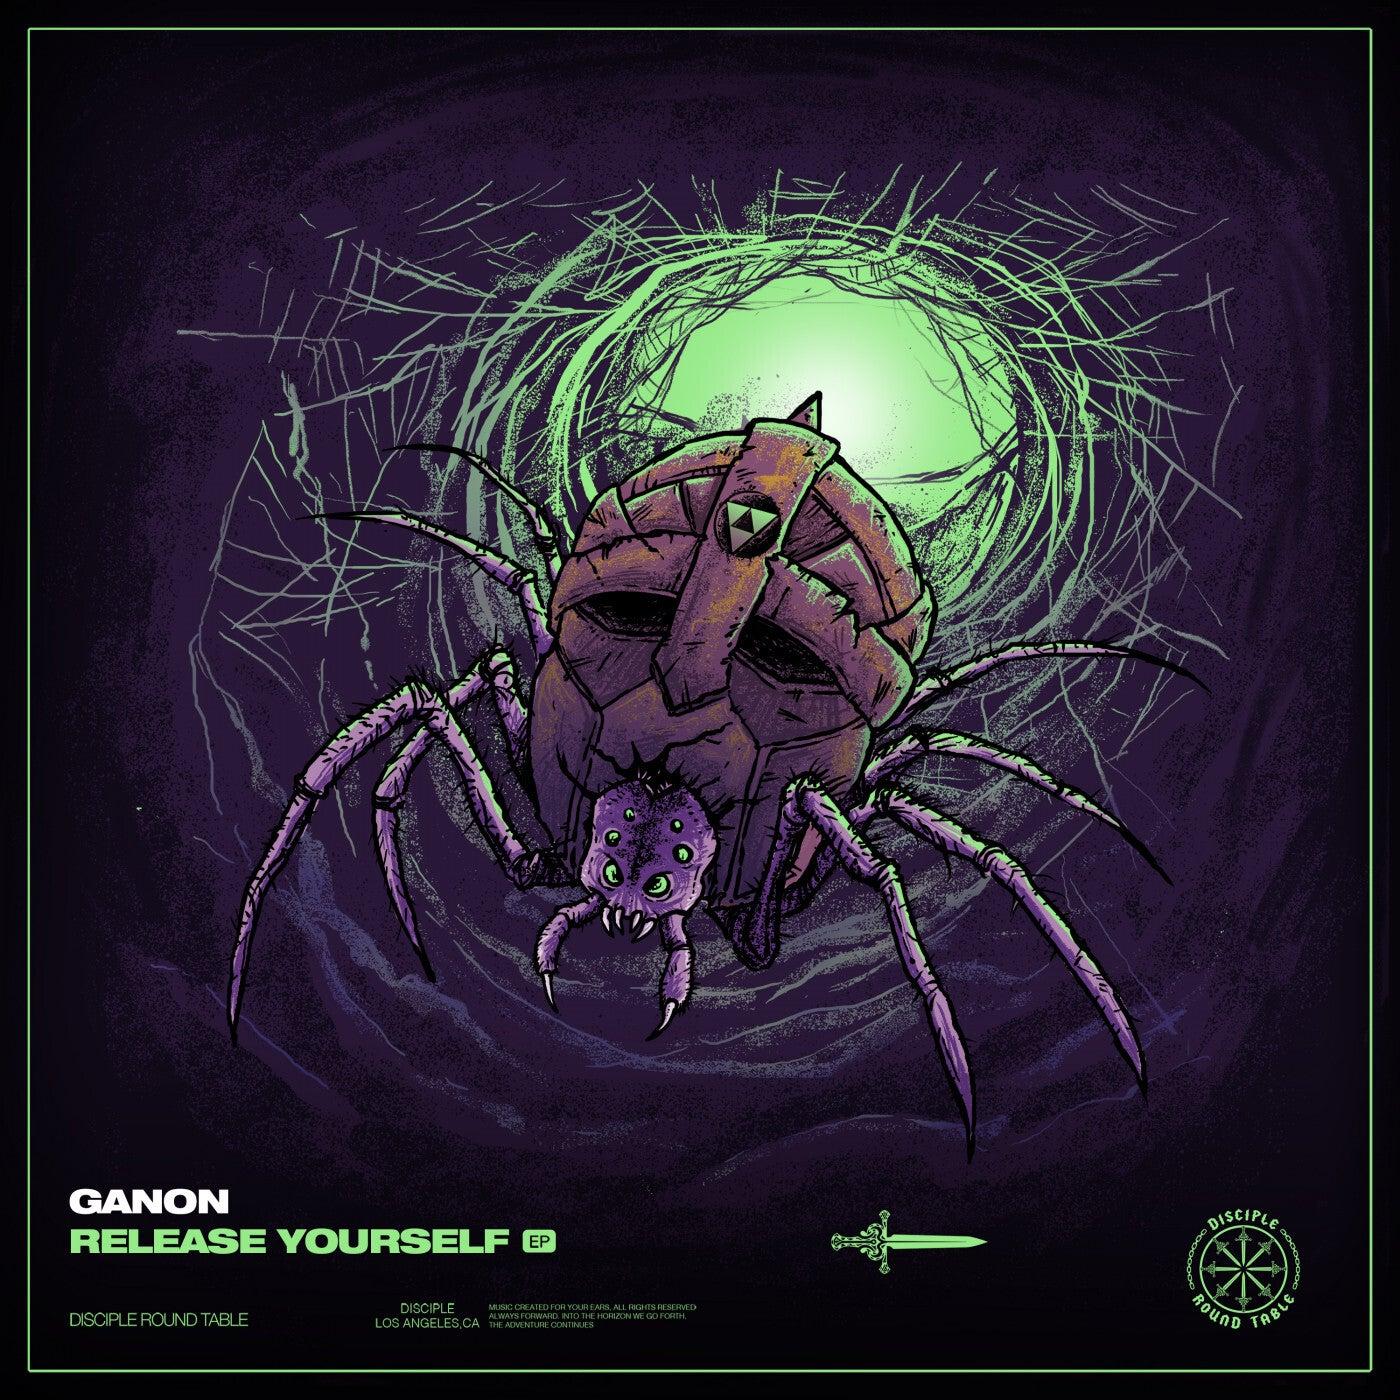 Release Yourself (Original Mix)